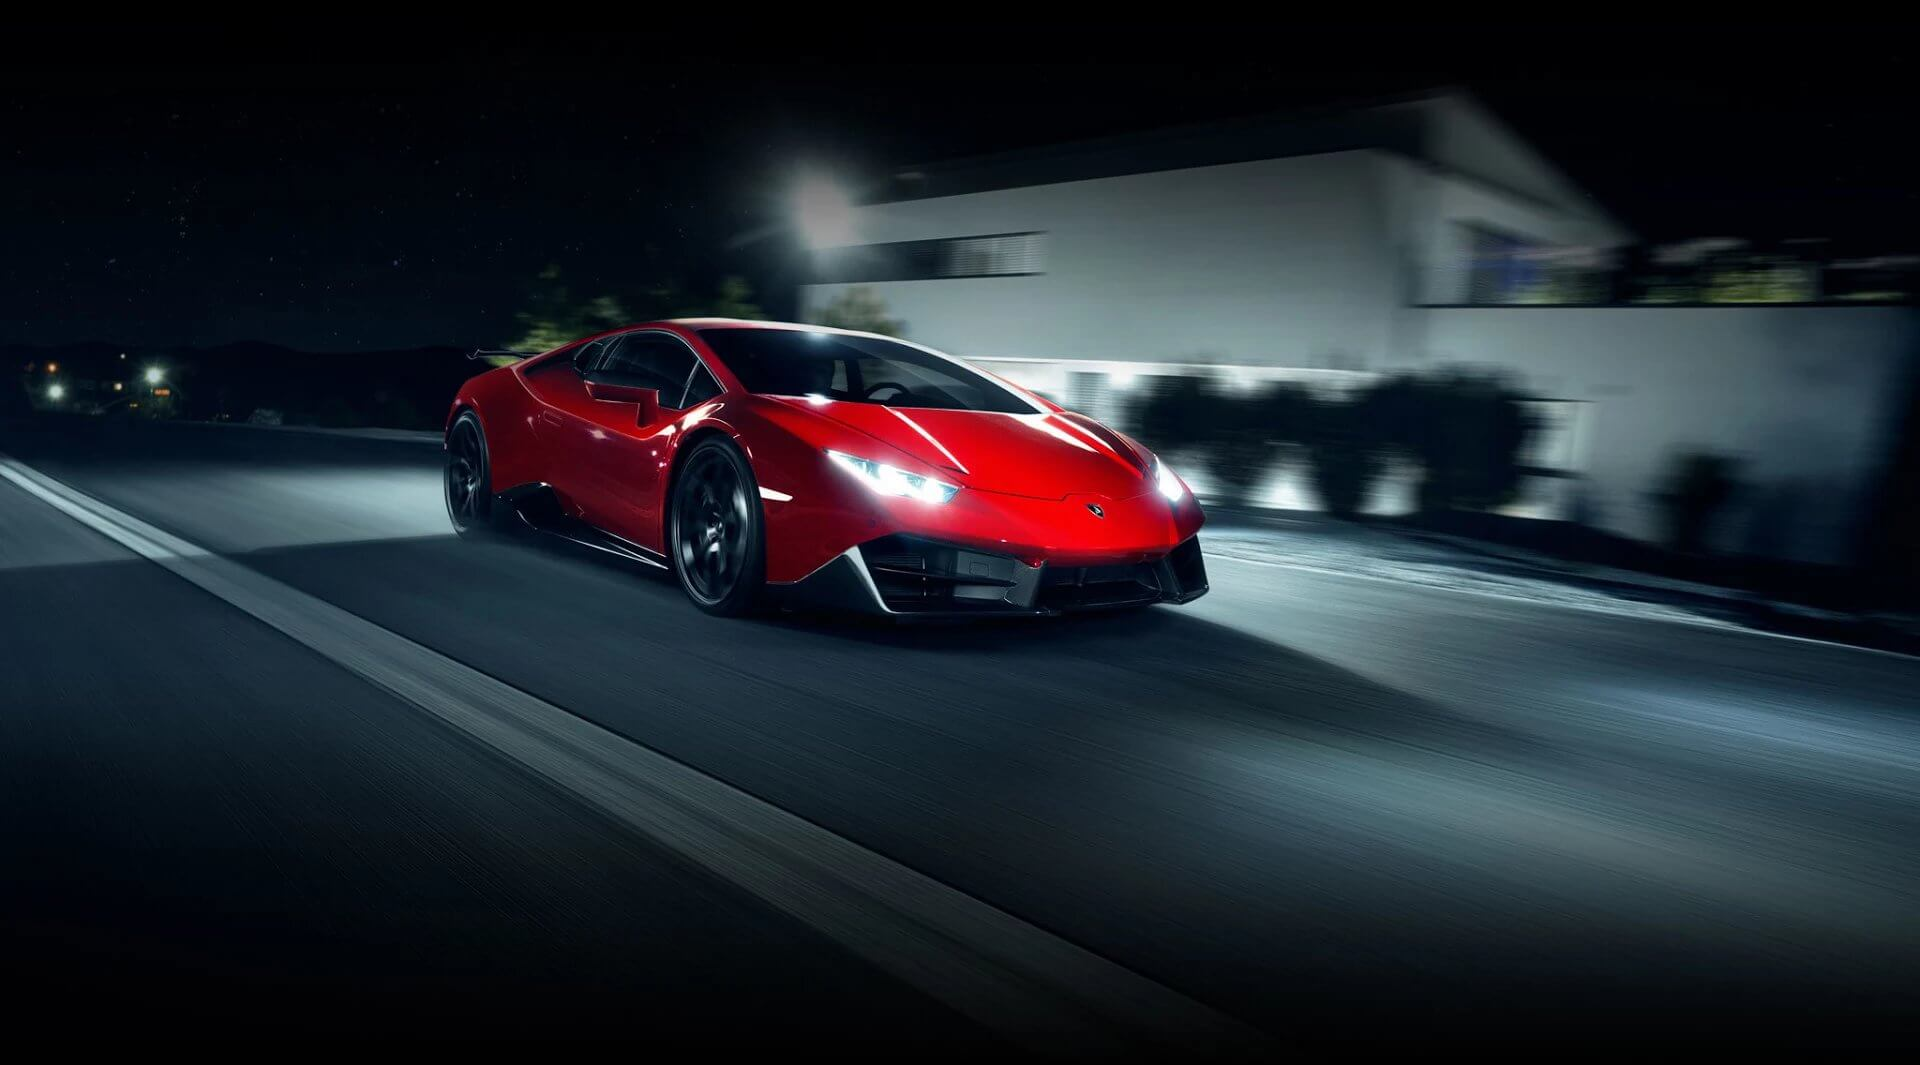 Lamborghini-Huracan-Novitec-Torado-RWD-lamborghini-novitec-wallpaper-wp5208640